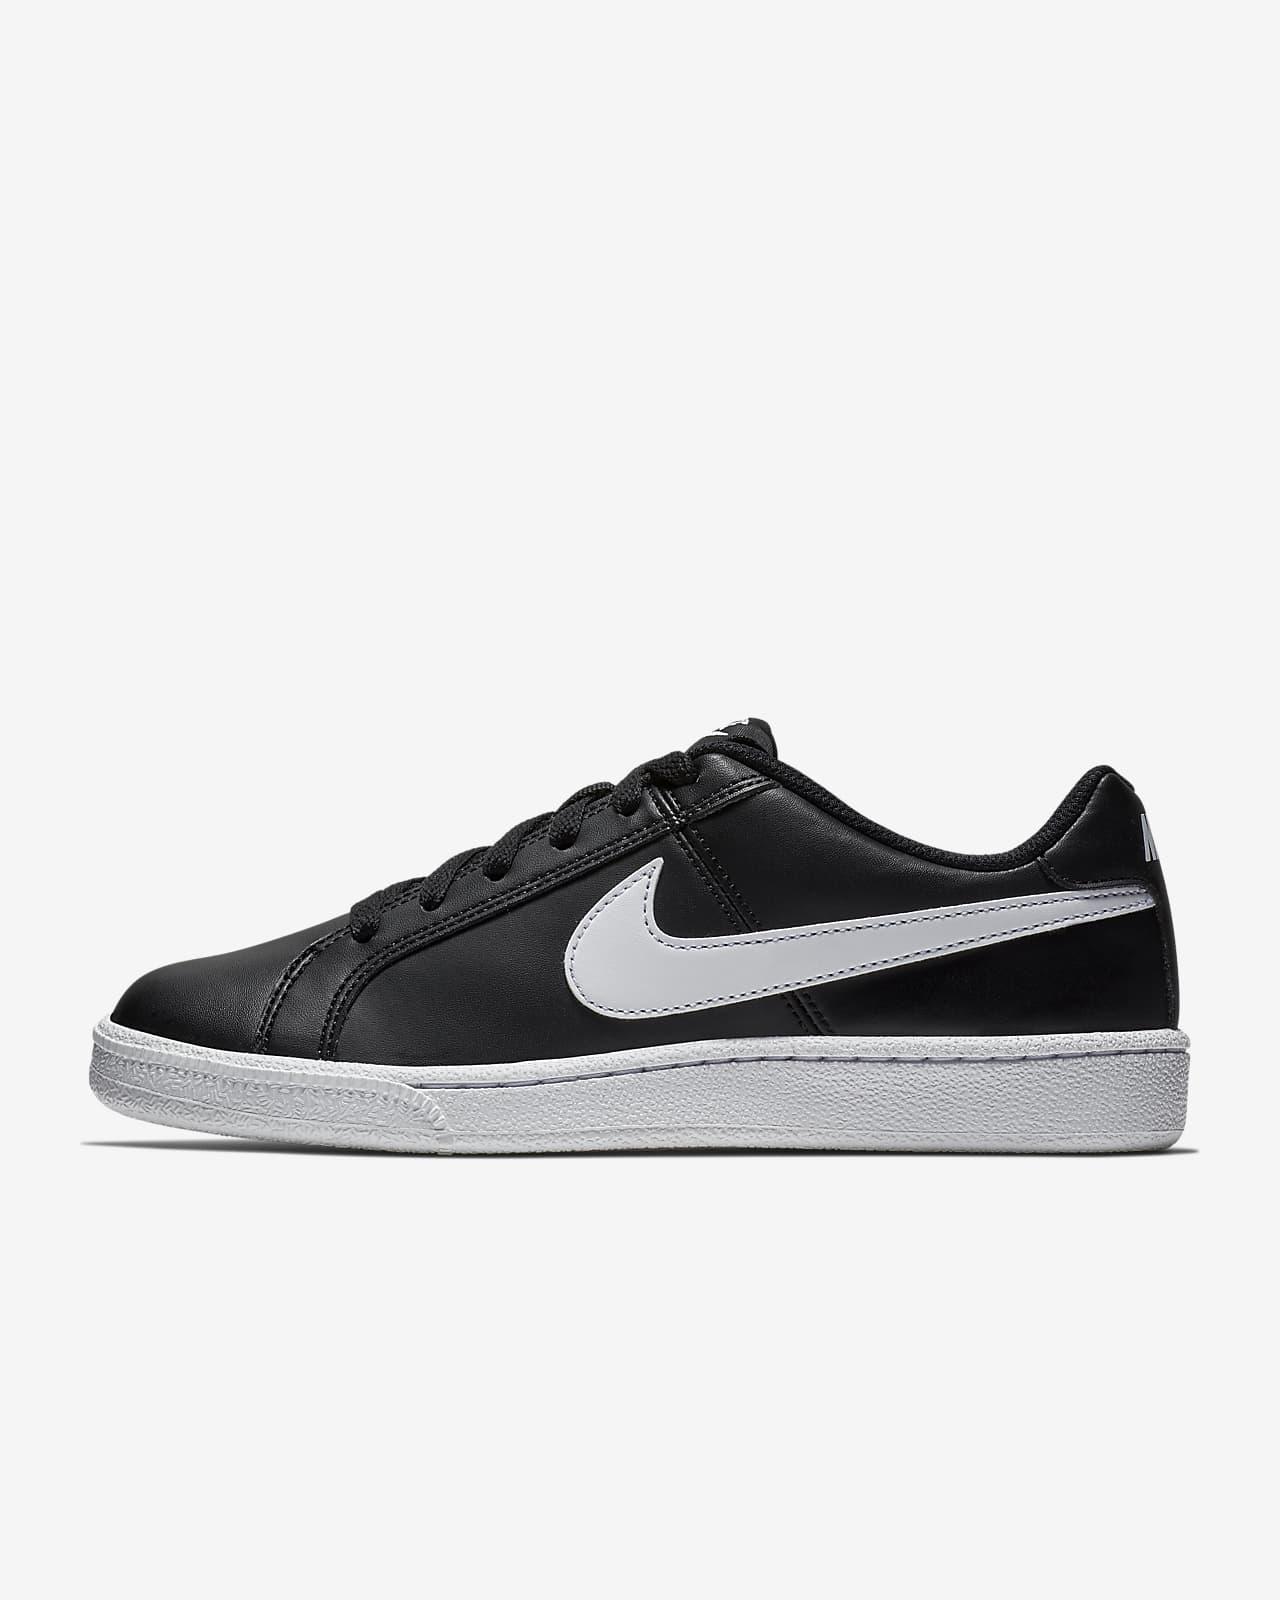 NikeCourt Royale SL Women's Shoe. Nike SG